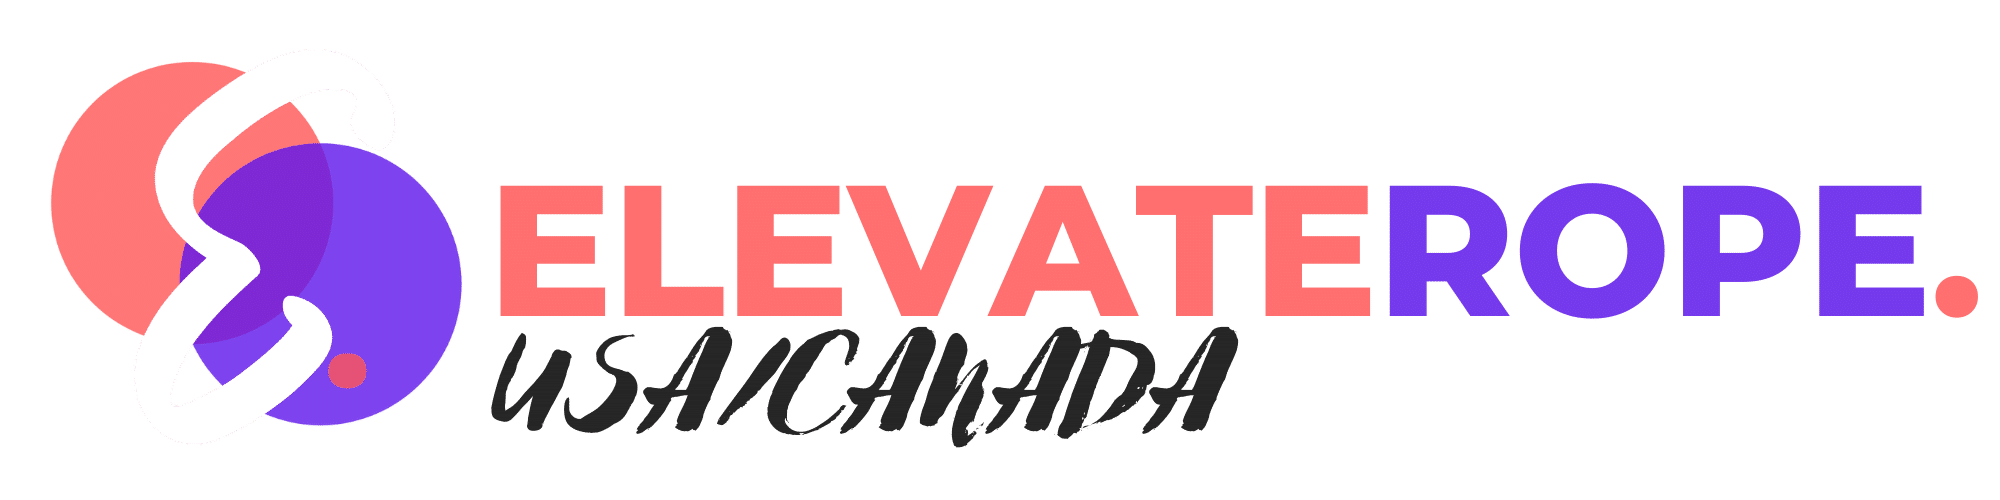 Elevate rope USA/CANADA